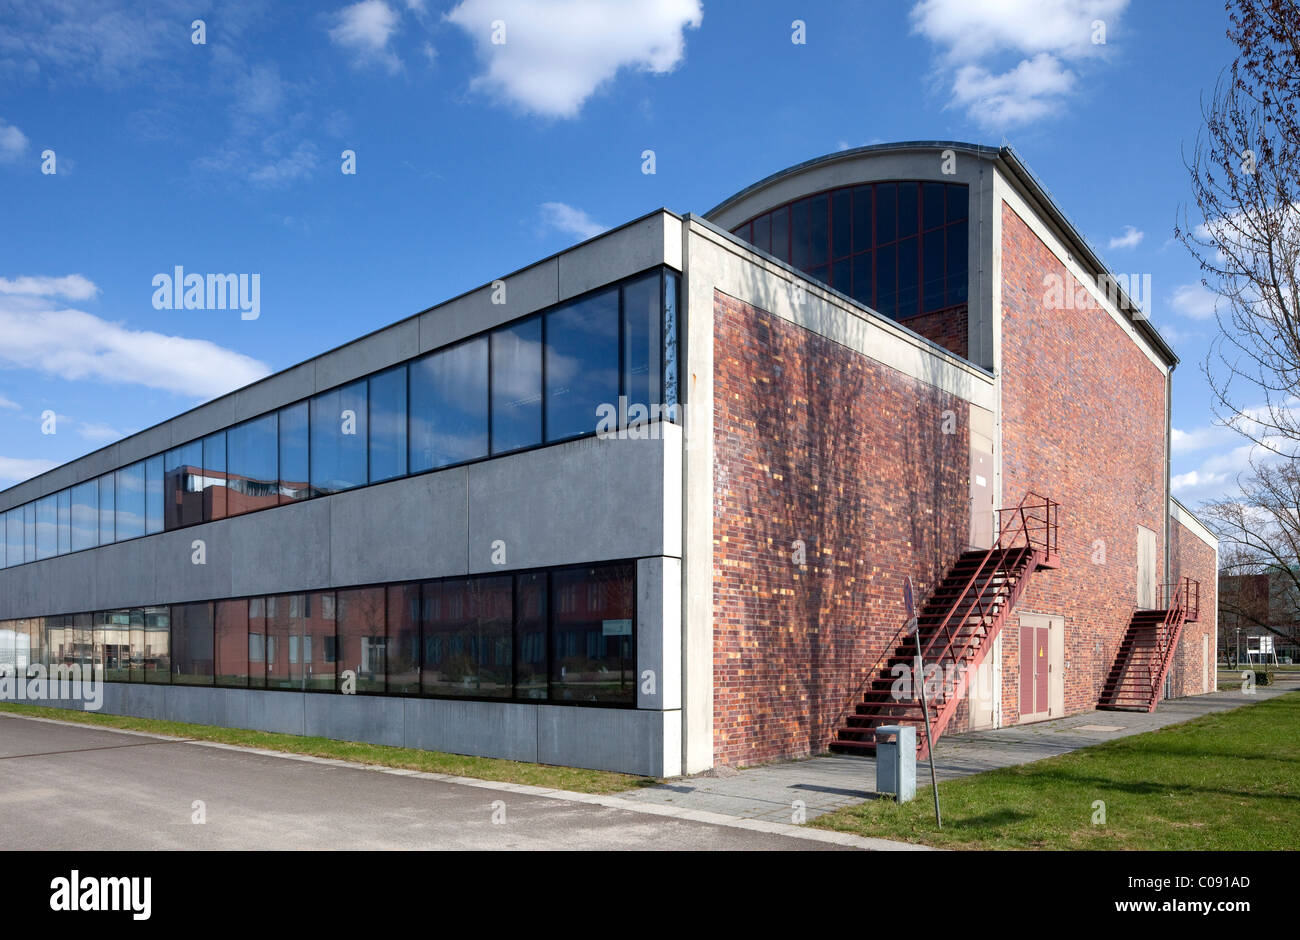 Airfield hangar of the former Johannisthal airport, Humboldt-Universitaet university, Wissenschaftsstadt Adlershof Stock Photo